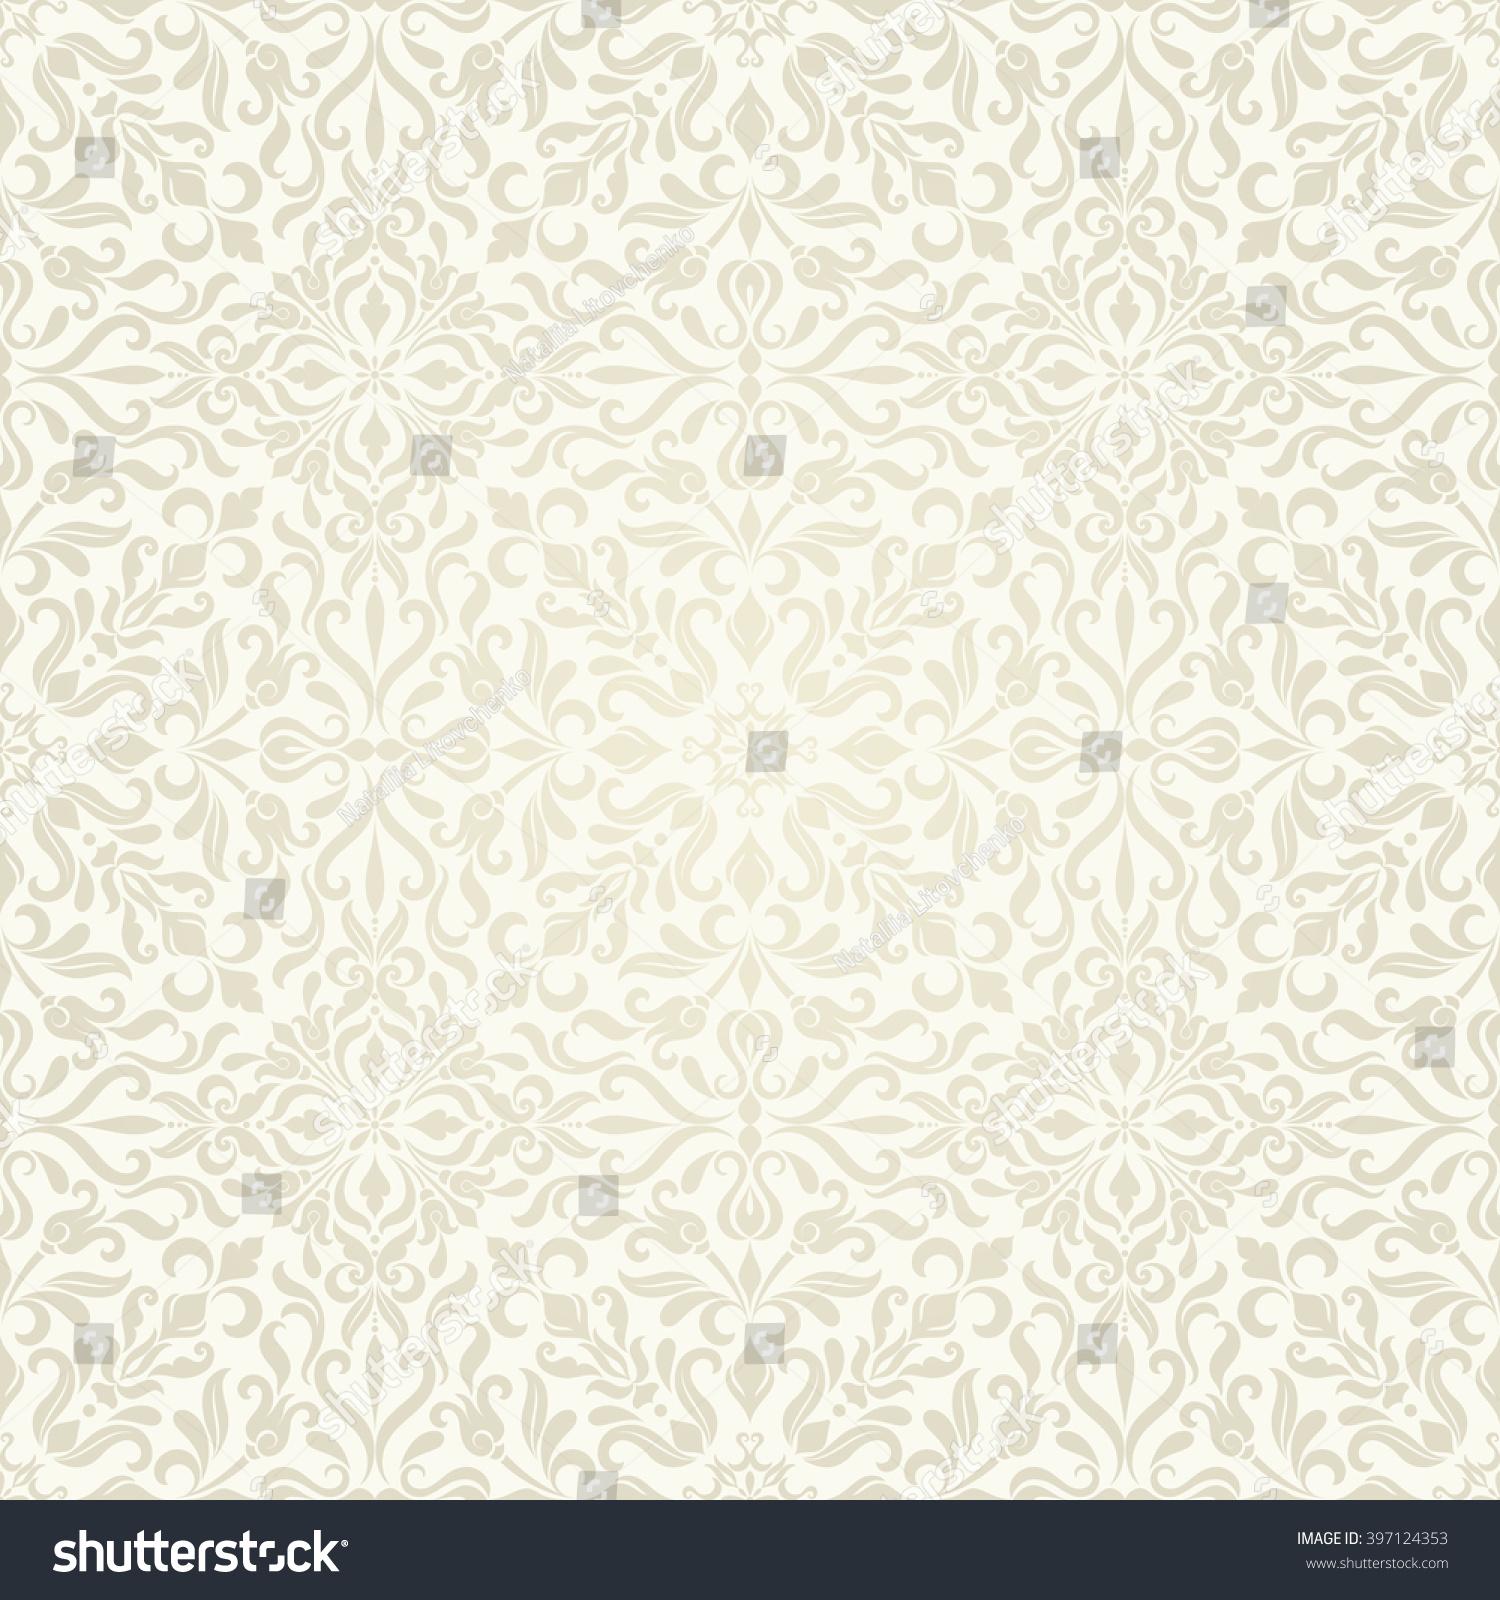 baroque print wallpaper - photo #44